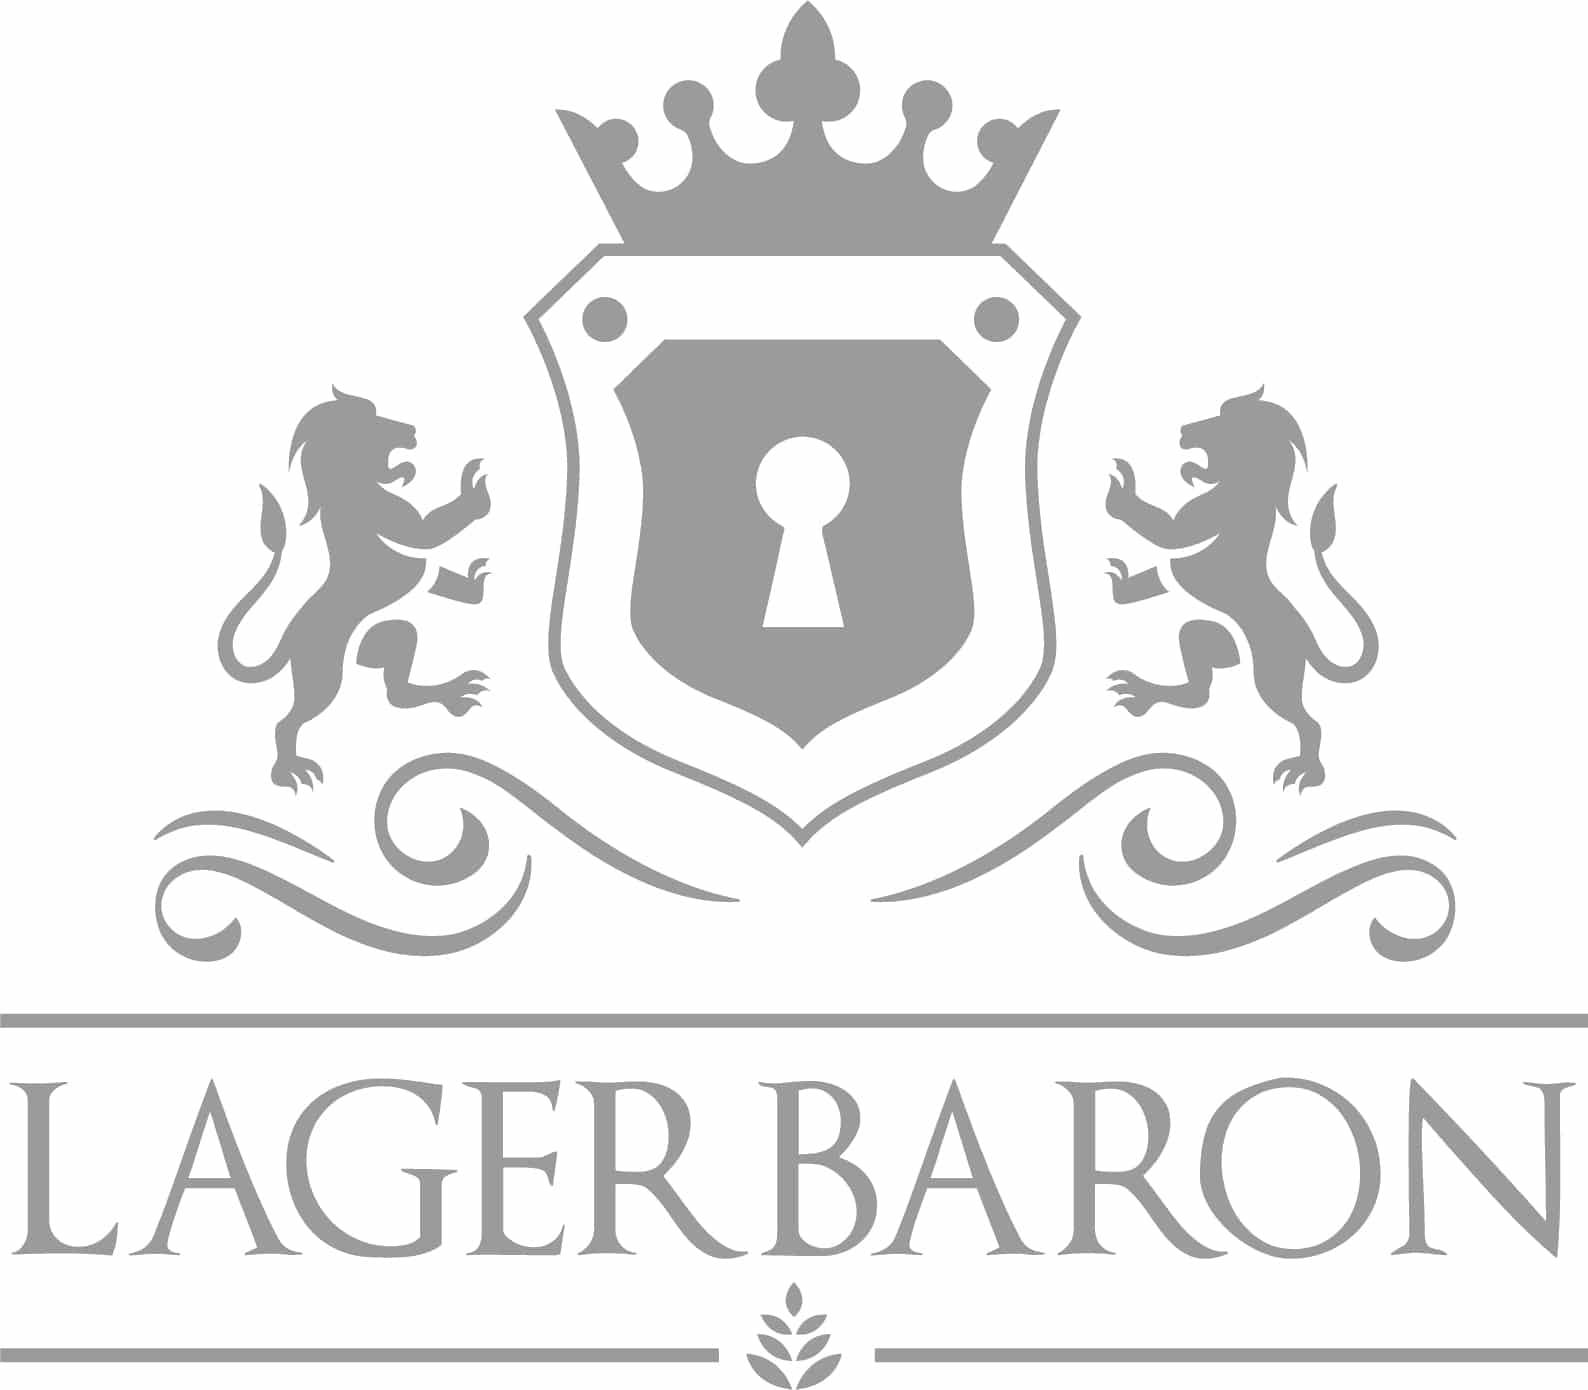 LAGERBARON